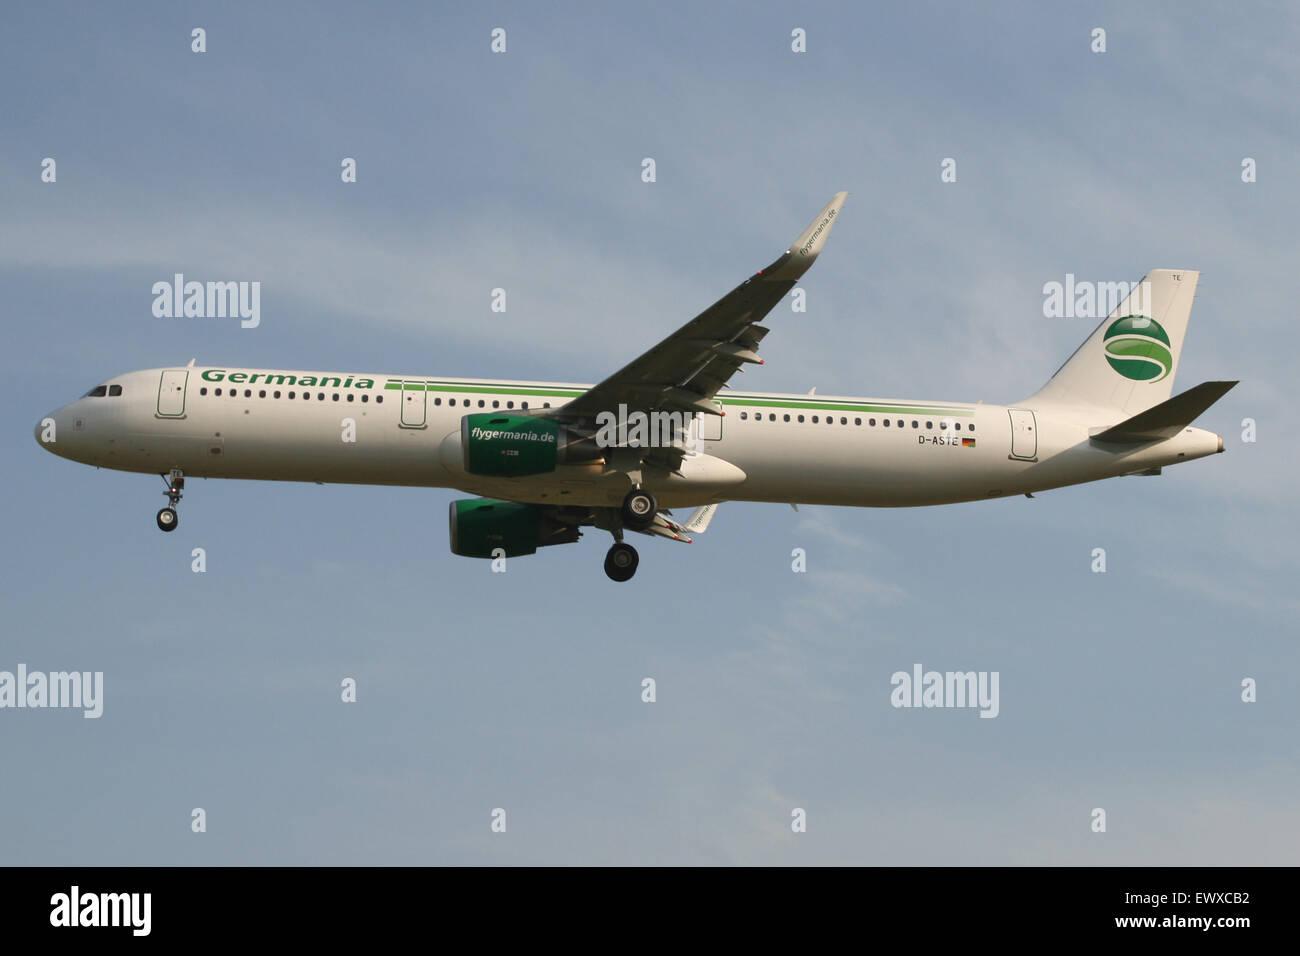 GERMANIA A321 Immagini Stock